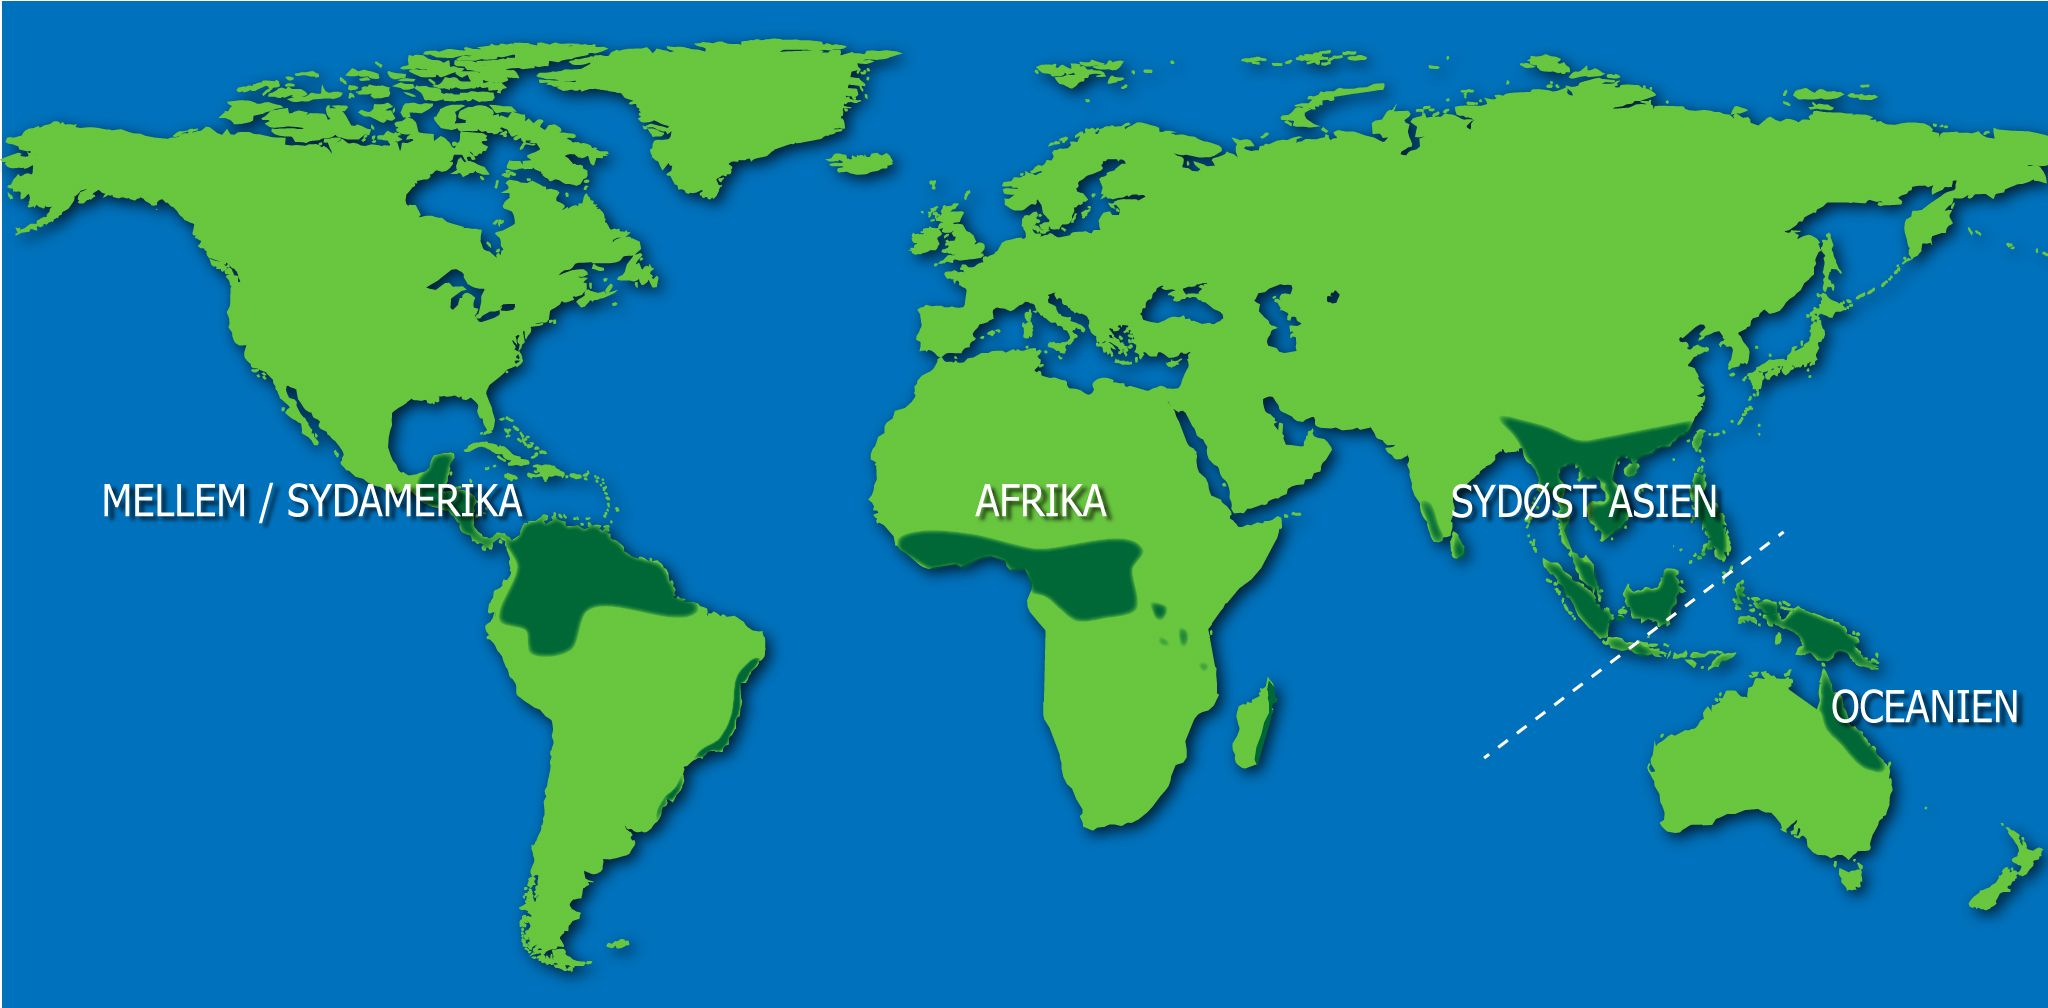 Australien Kontinent Kort Kort Over Australien Kontinent